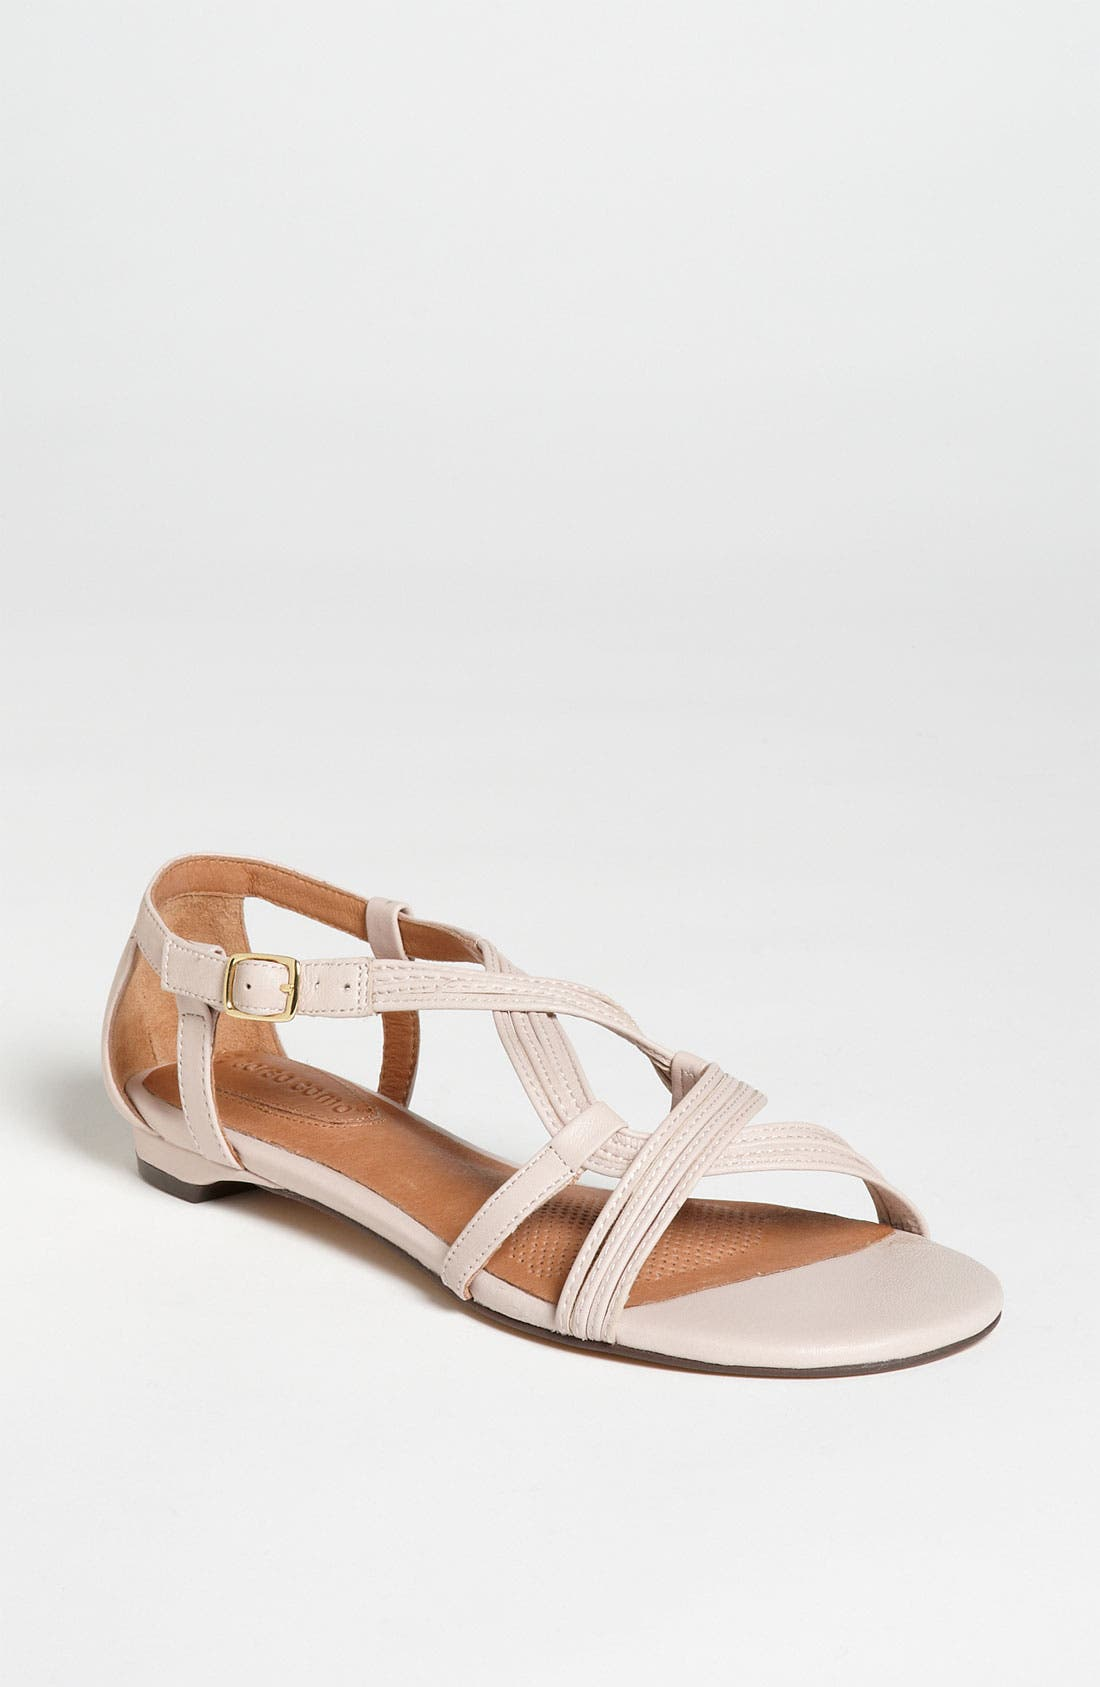 Main Image - Corso Como 'Future' Sandal